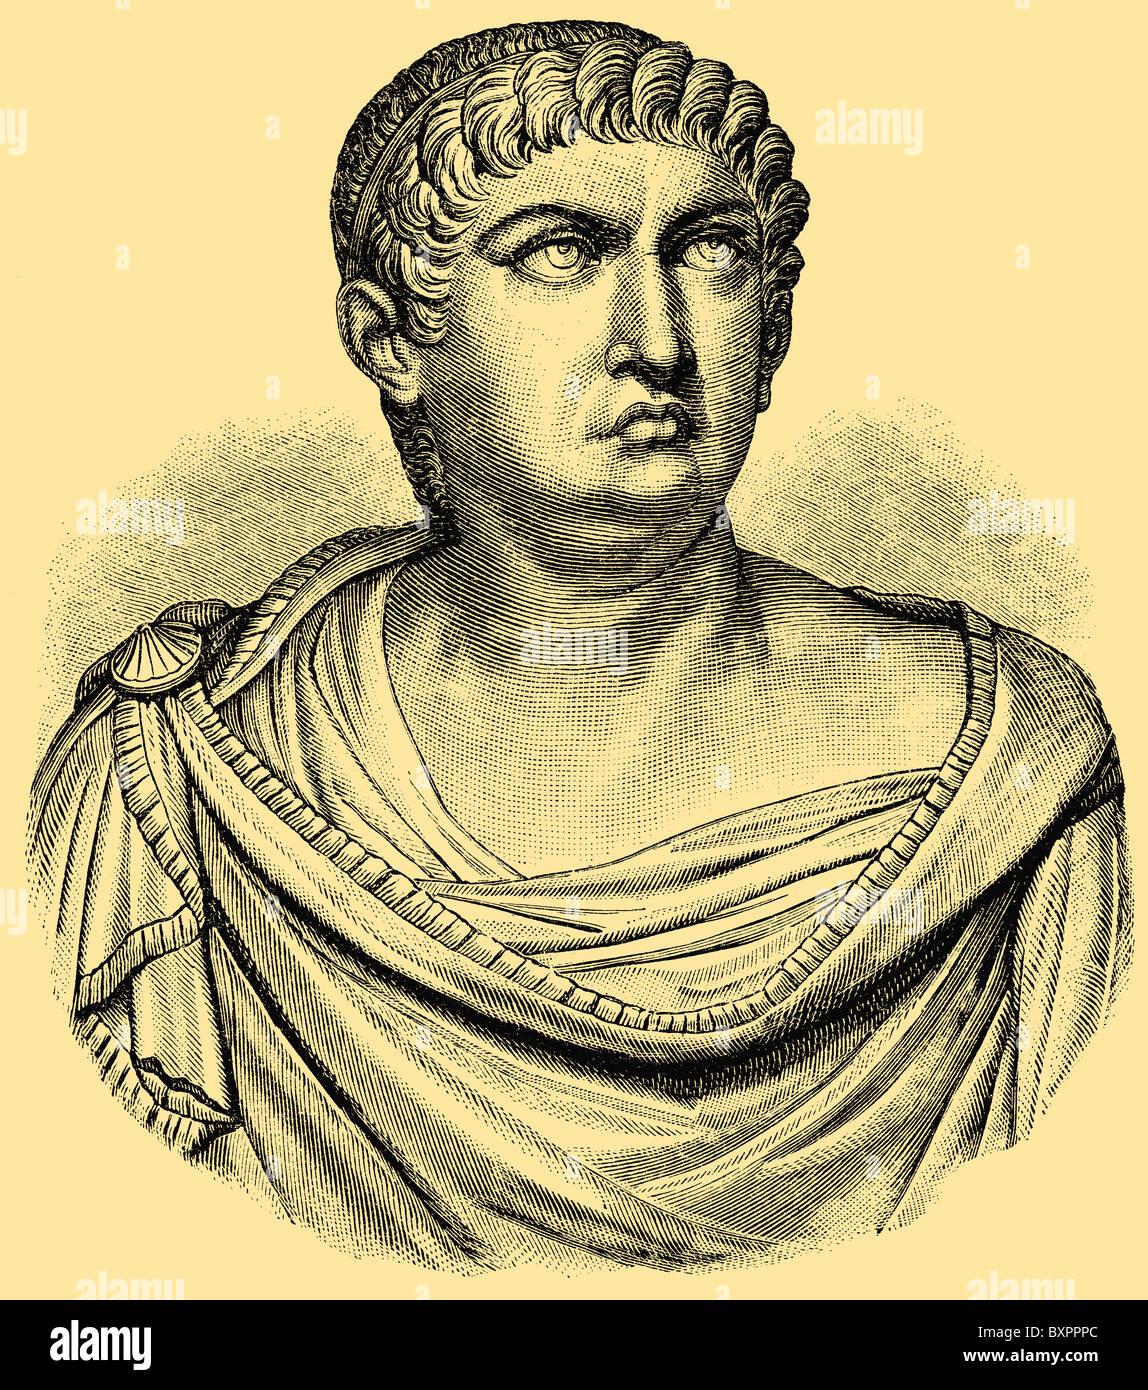 Nero (37 - 68), Roman emperor  - Stock Image